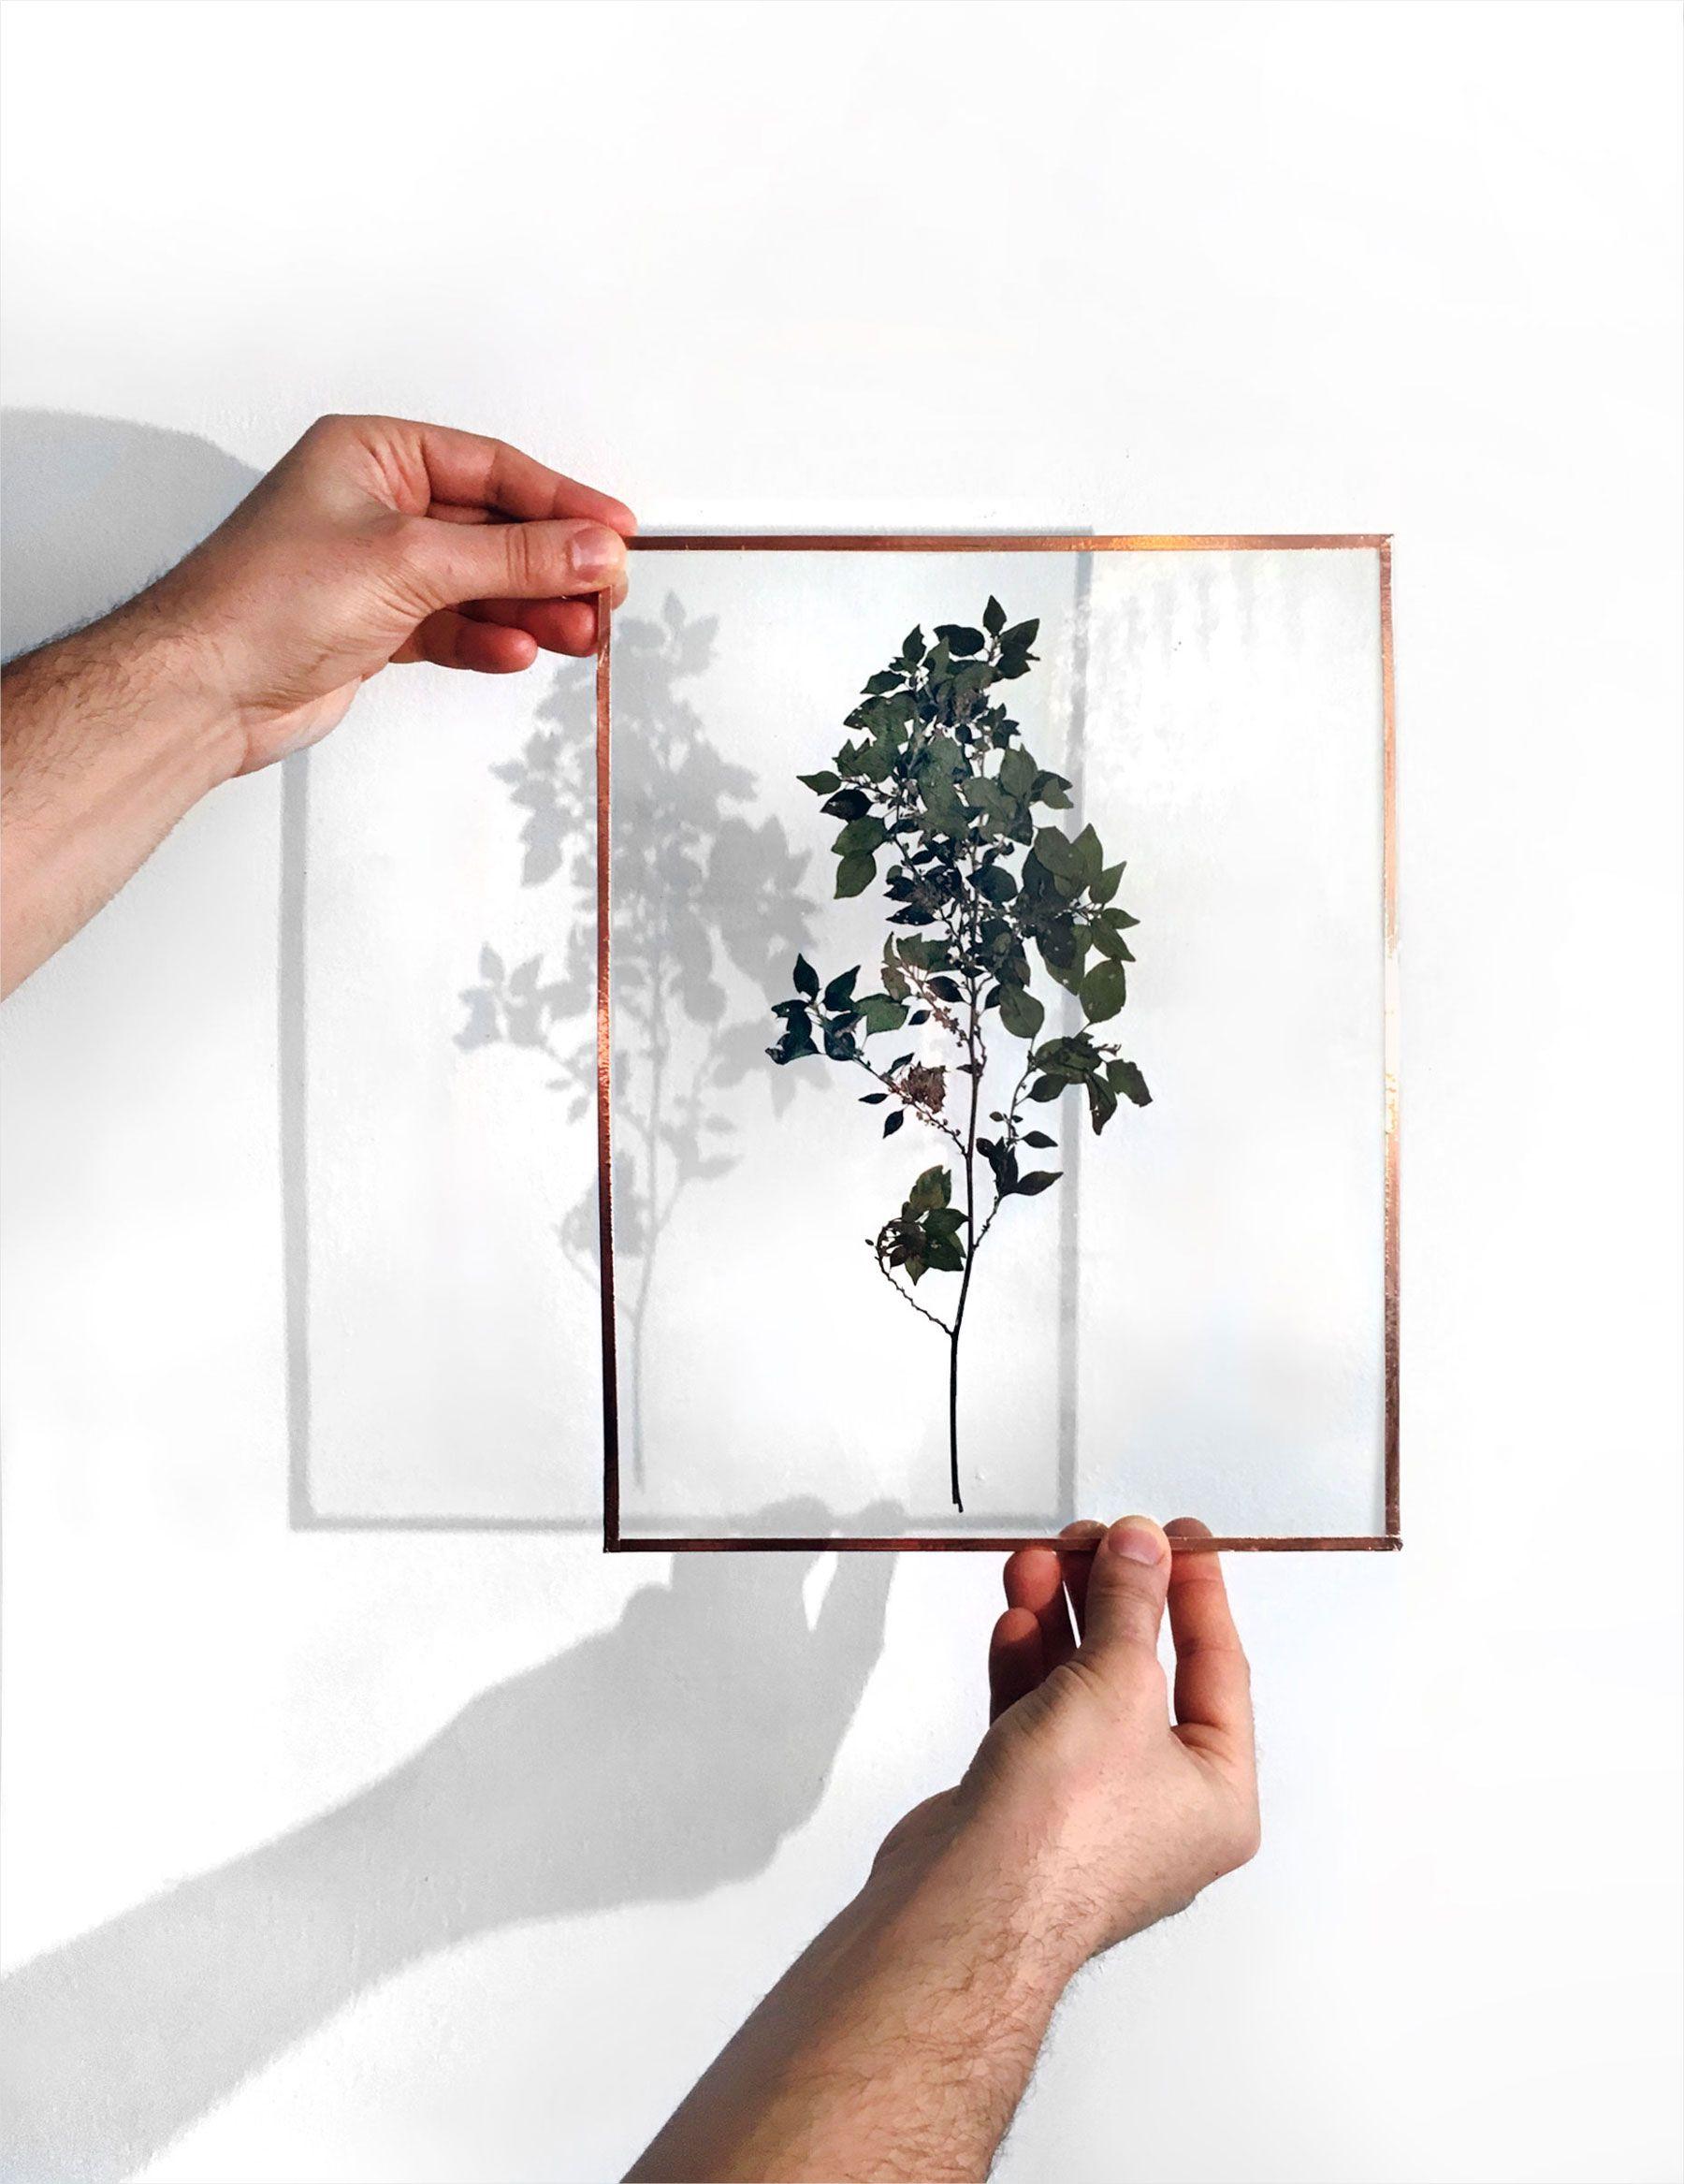 diy herbier cuivre cadre verre do it yourself inspiration tendance tutoriel. Black Bedroom Furniture Sets. Home Design Ideas